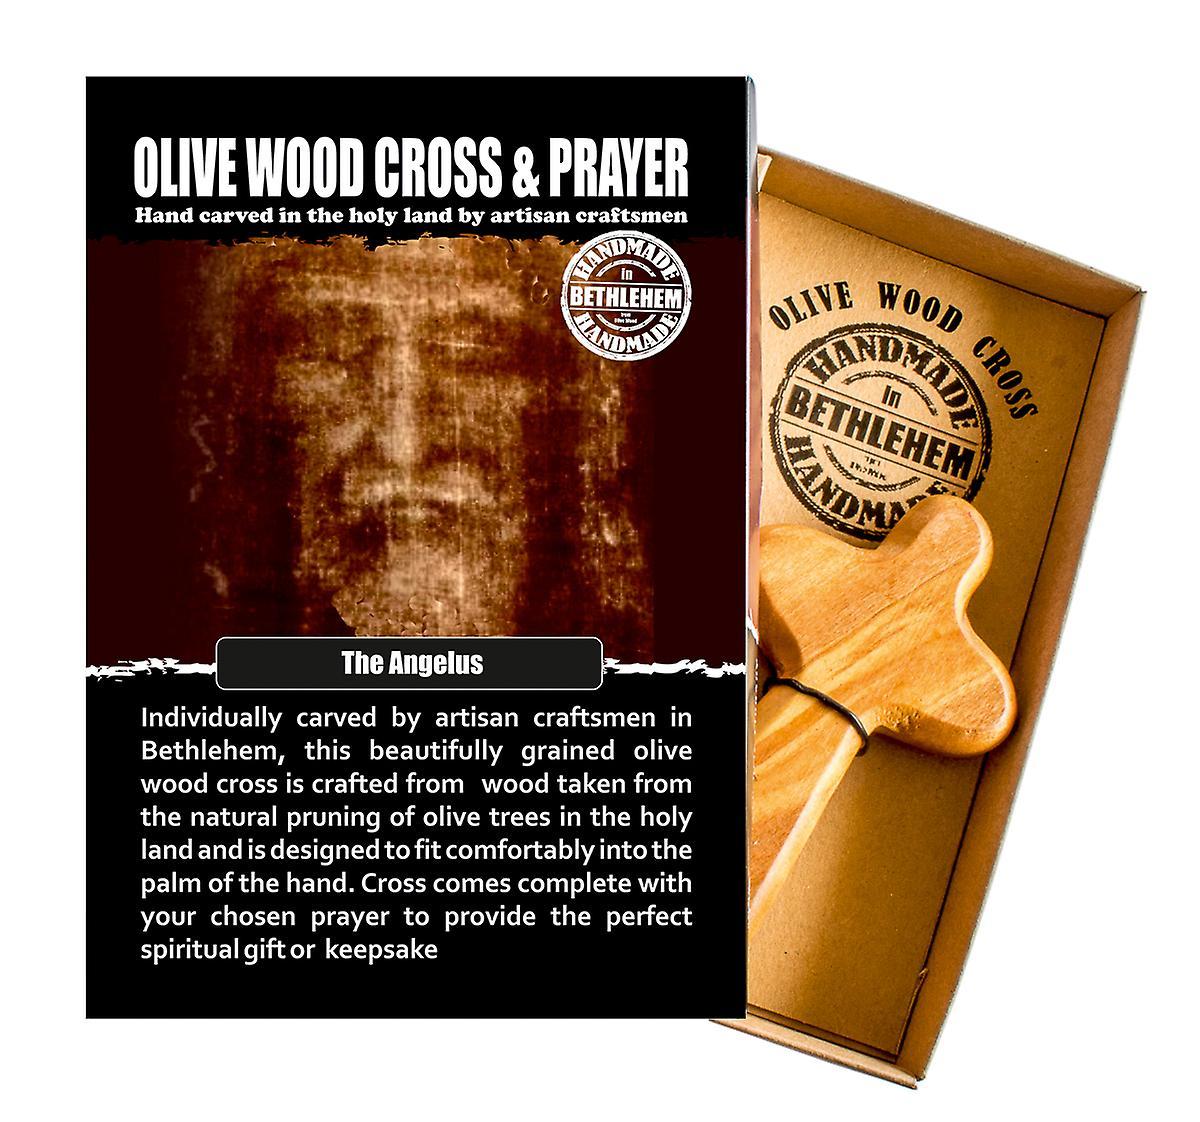 The Angelus Carved Olive Wood Comfort Cross Religious Keepsake Hand Made In Bethlehem